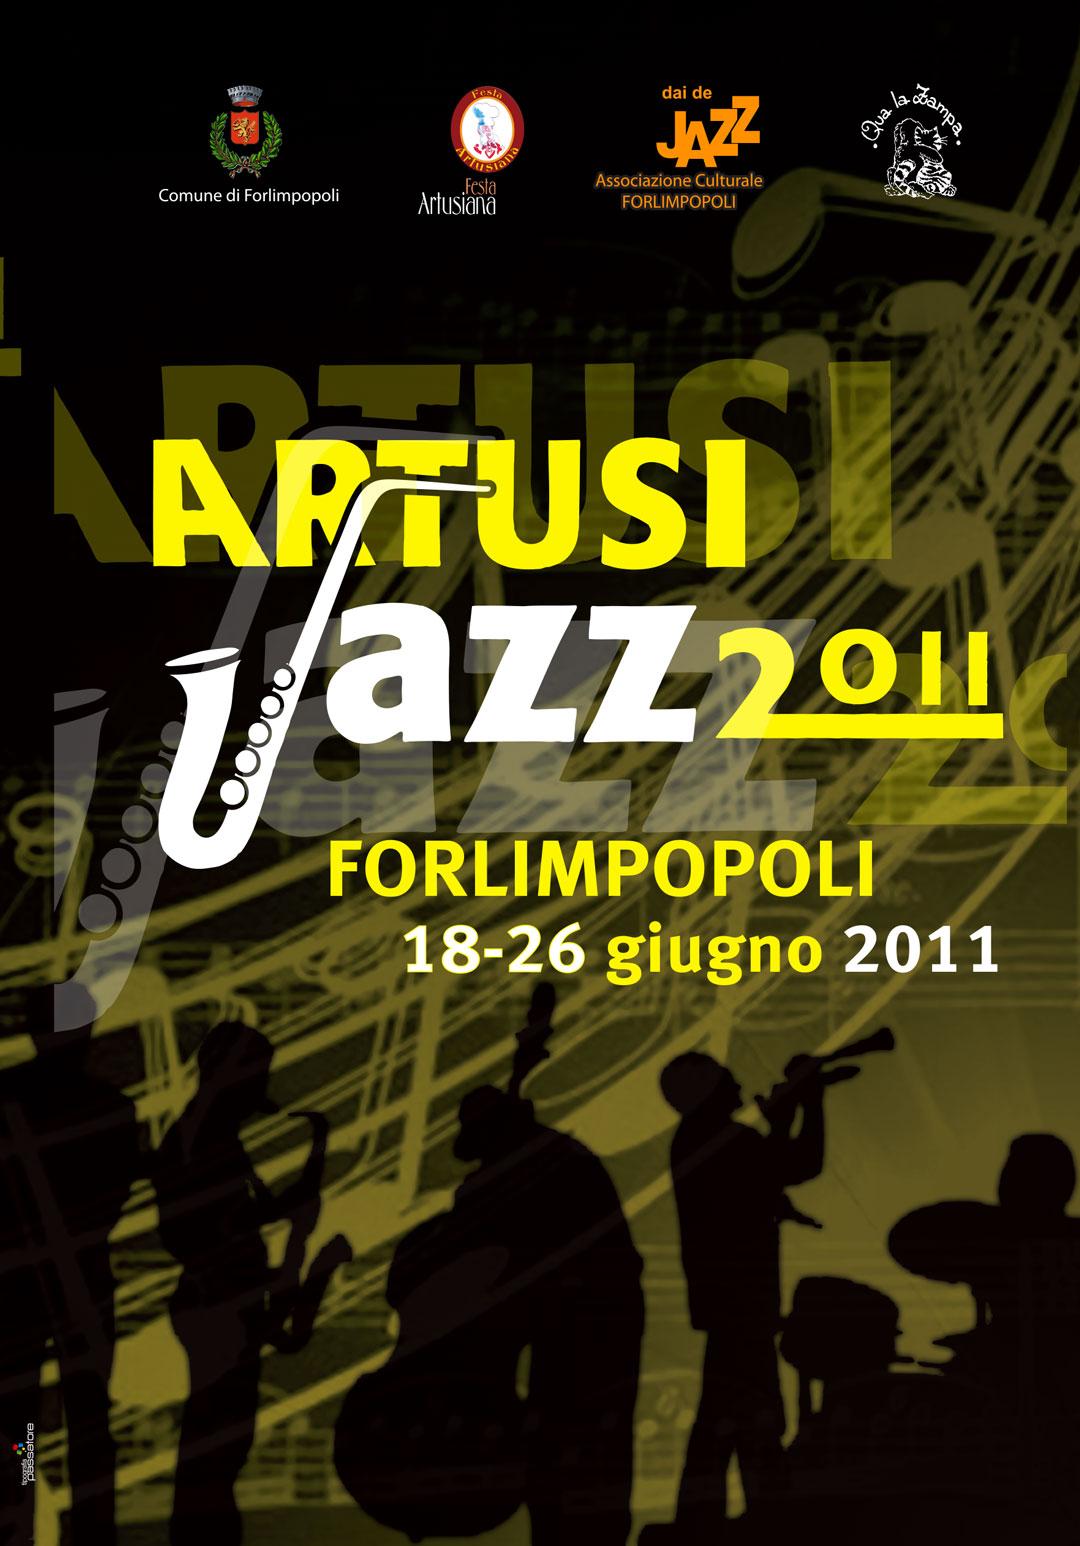 ARTUSI-JAZZ_Brochure_2011-1-pag1